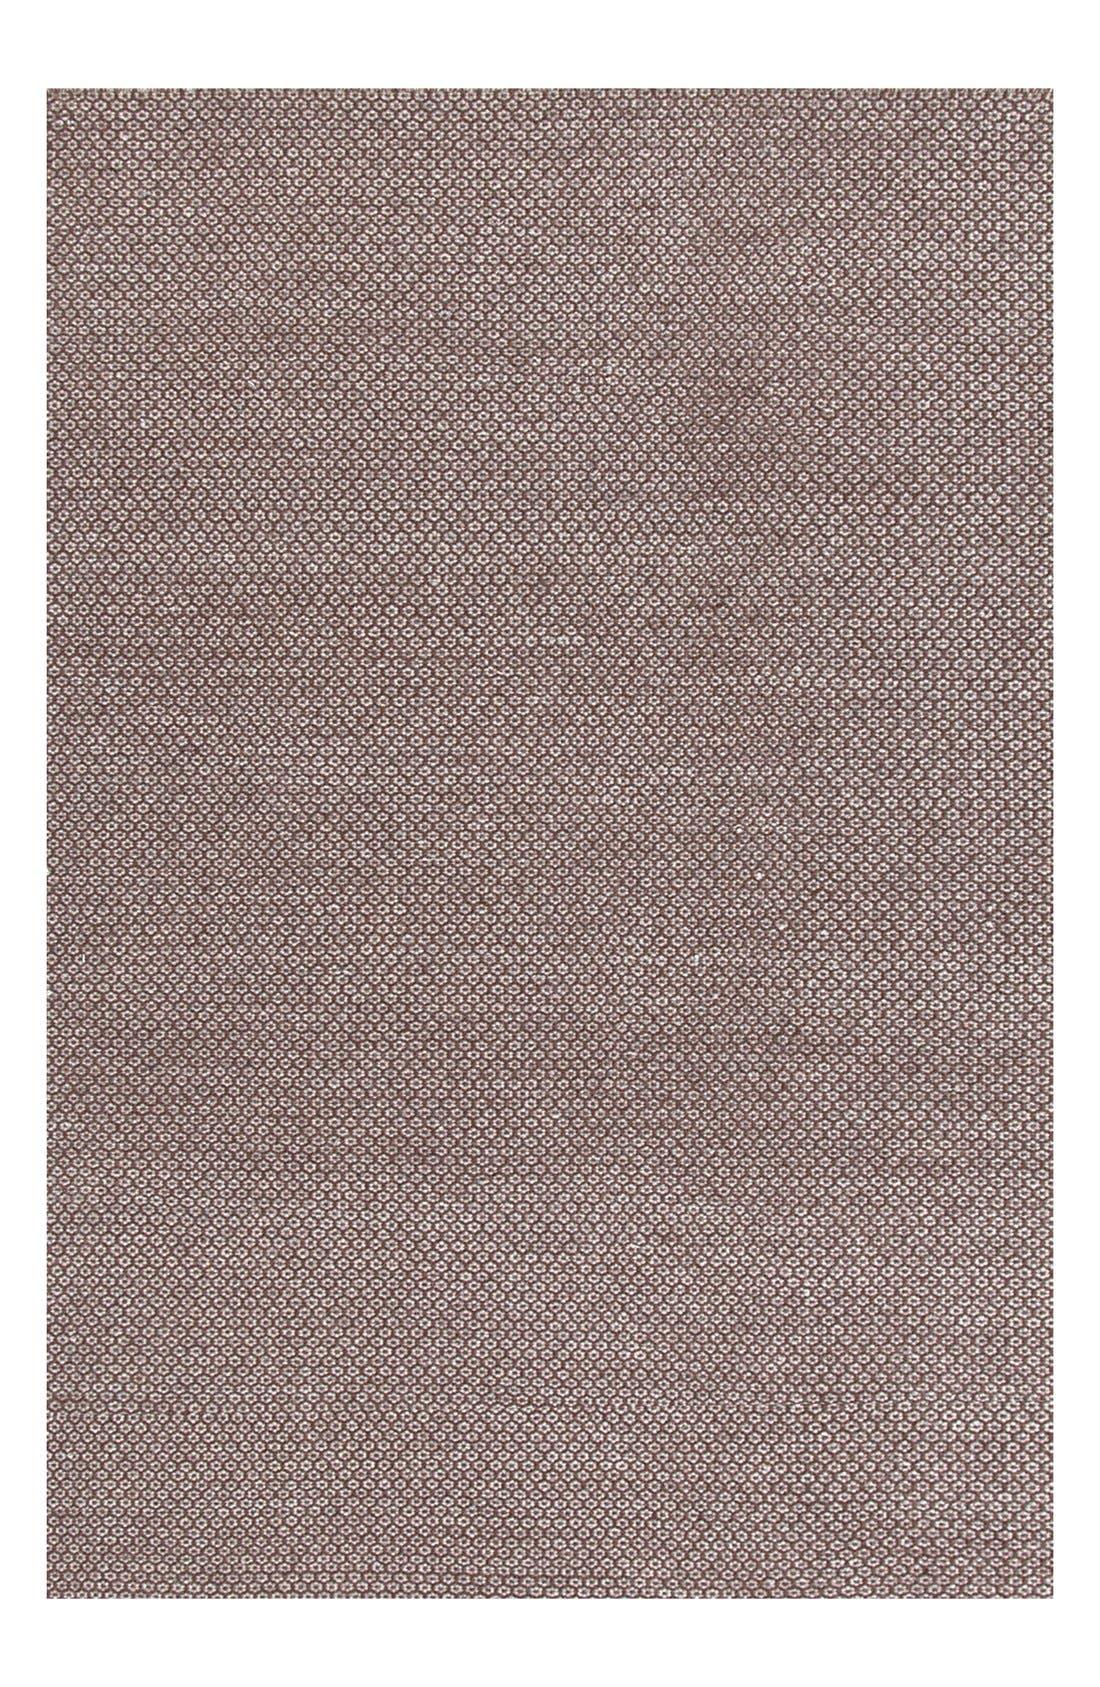 Main Image - Dash & Albert 'Honeycomb' Wool Rug